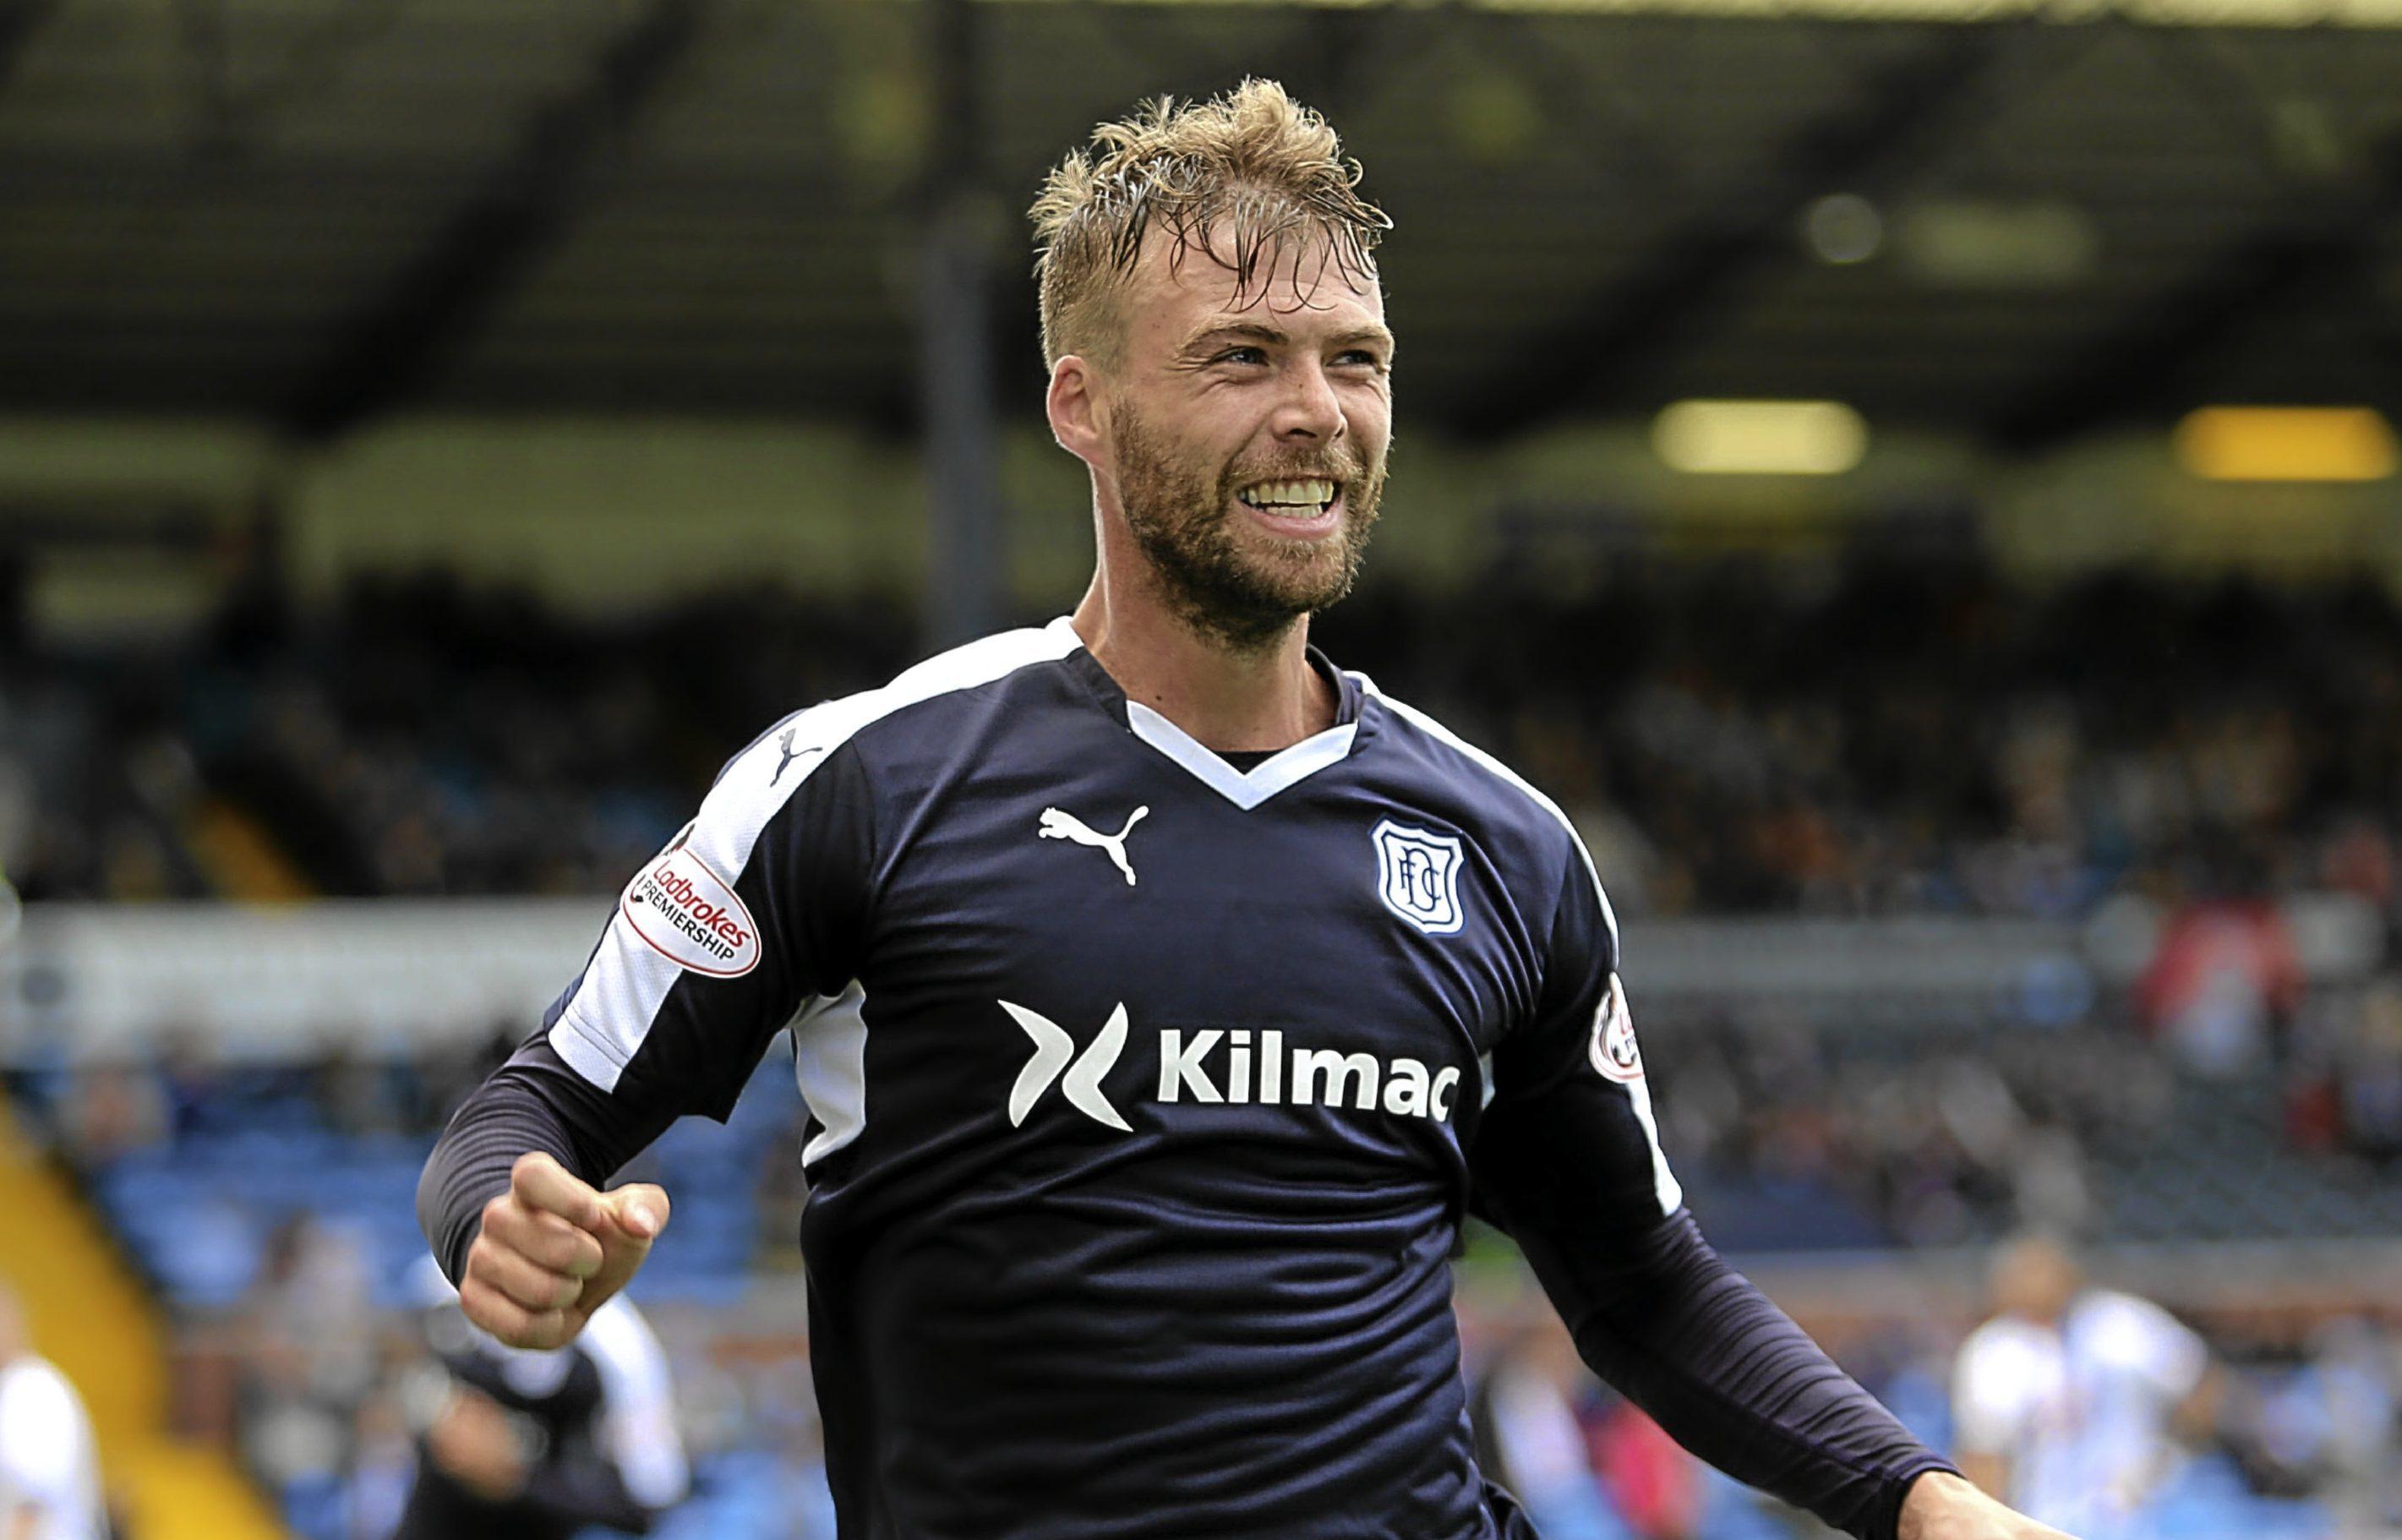 Dundee forward Rory Loy wants to rival strike partner Kane Hemmings next season.